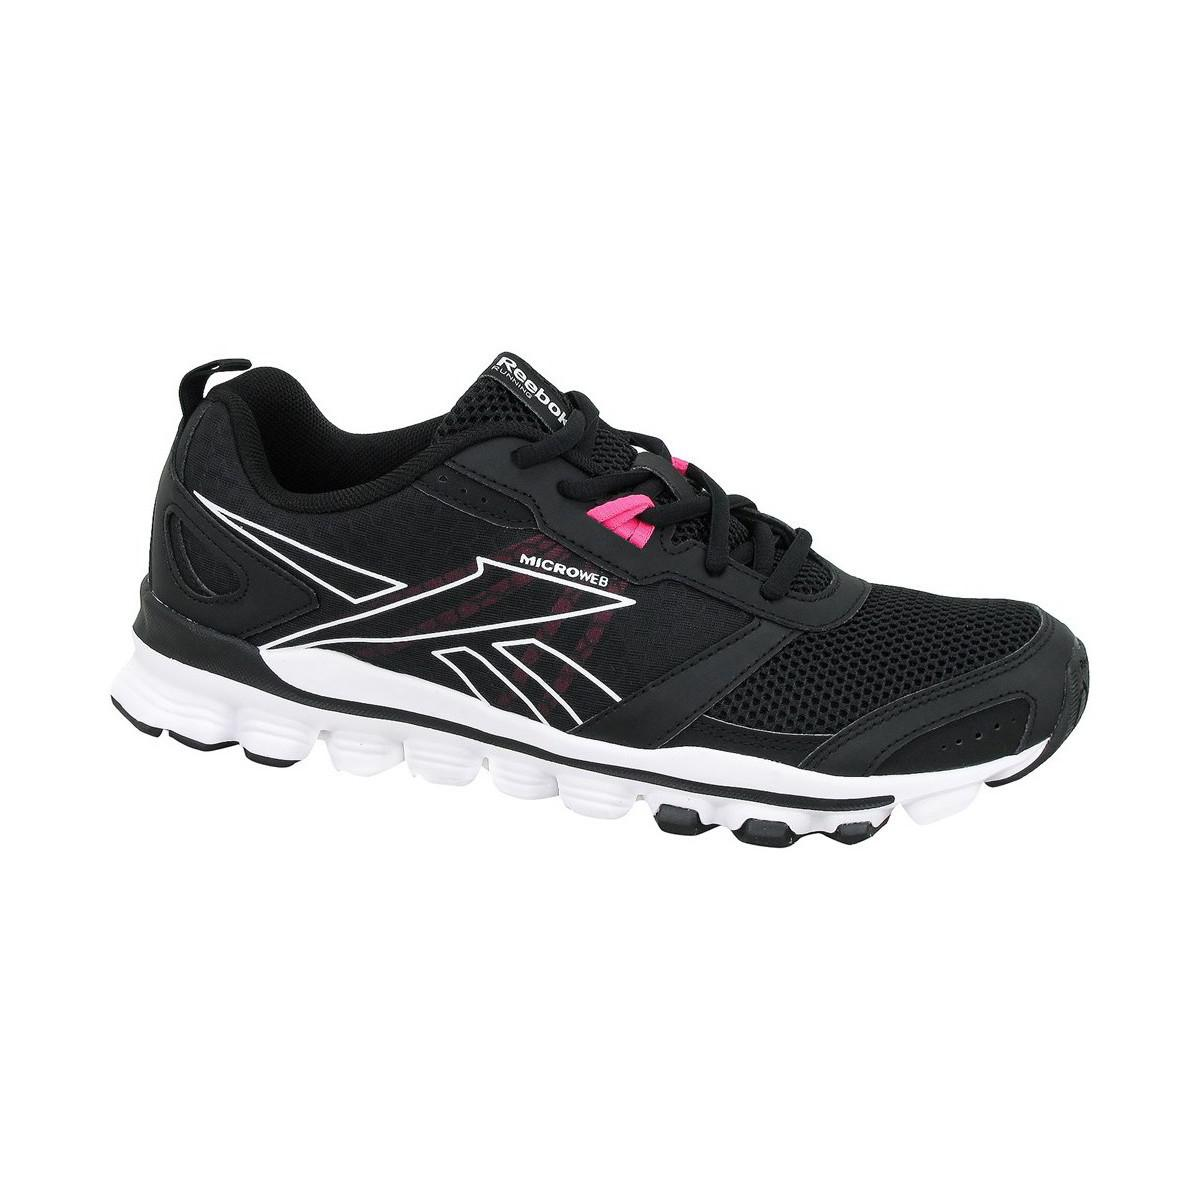 Reebok - Hexaffect Run Le Women s Shoes (trainers) In Black - Lyst. View  fullscreen e8f253709